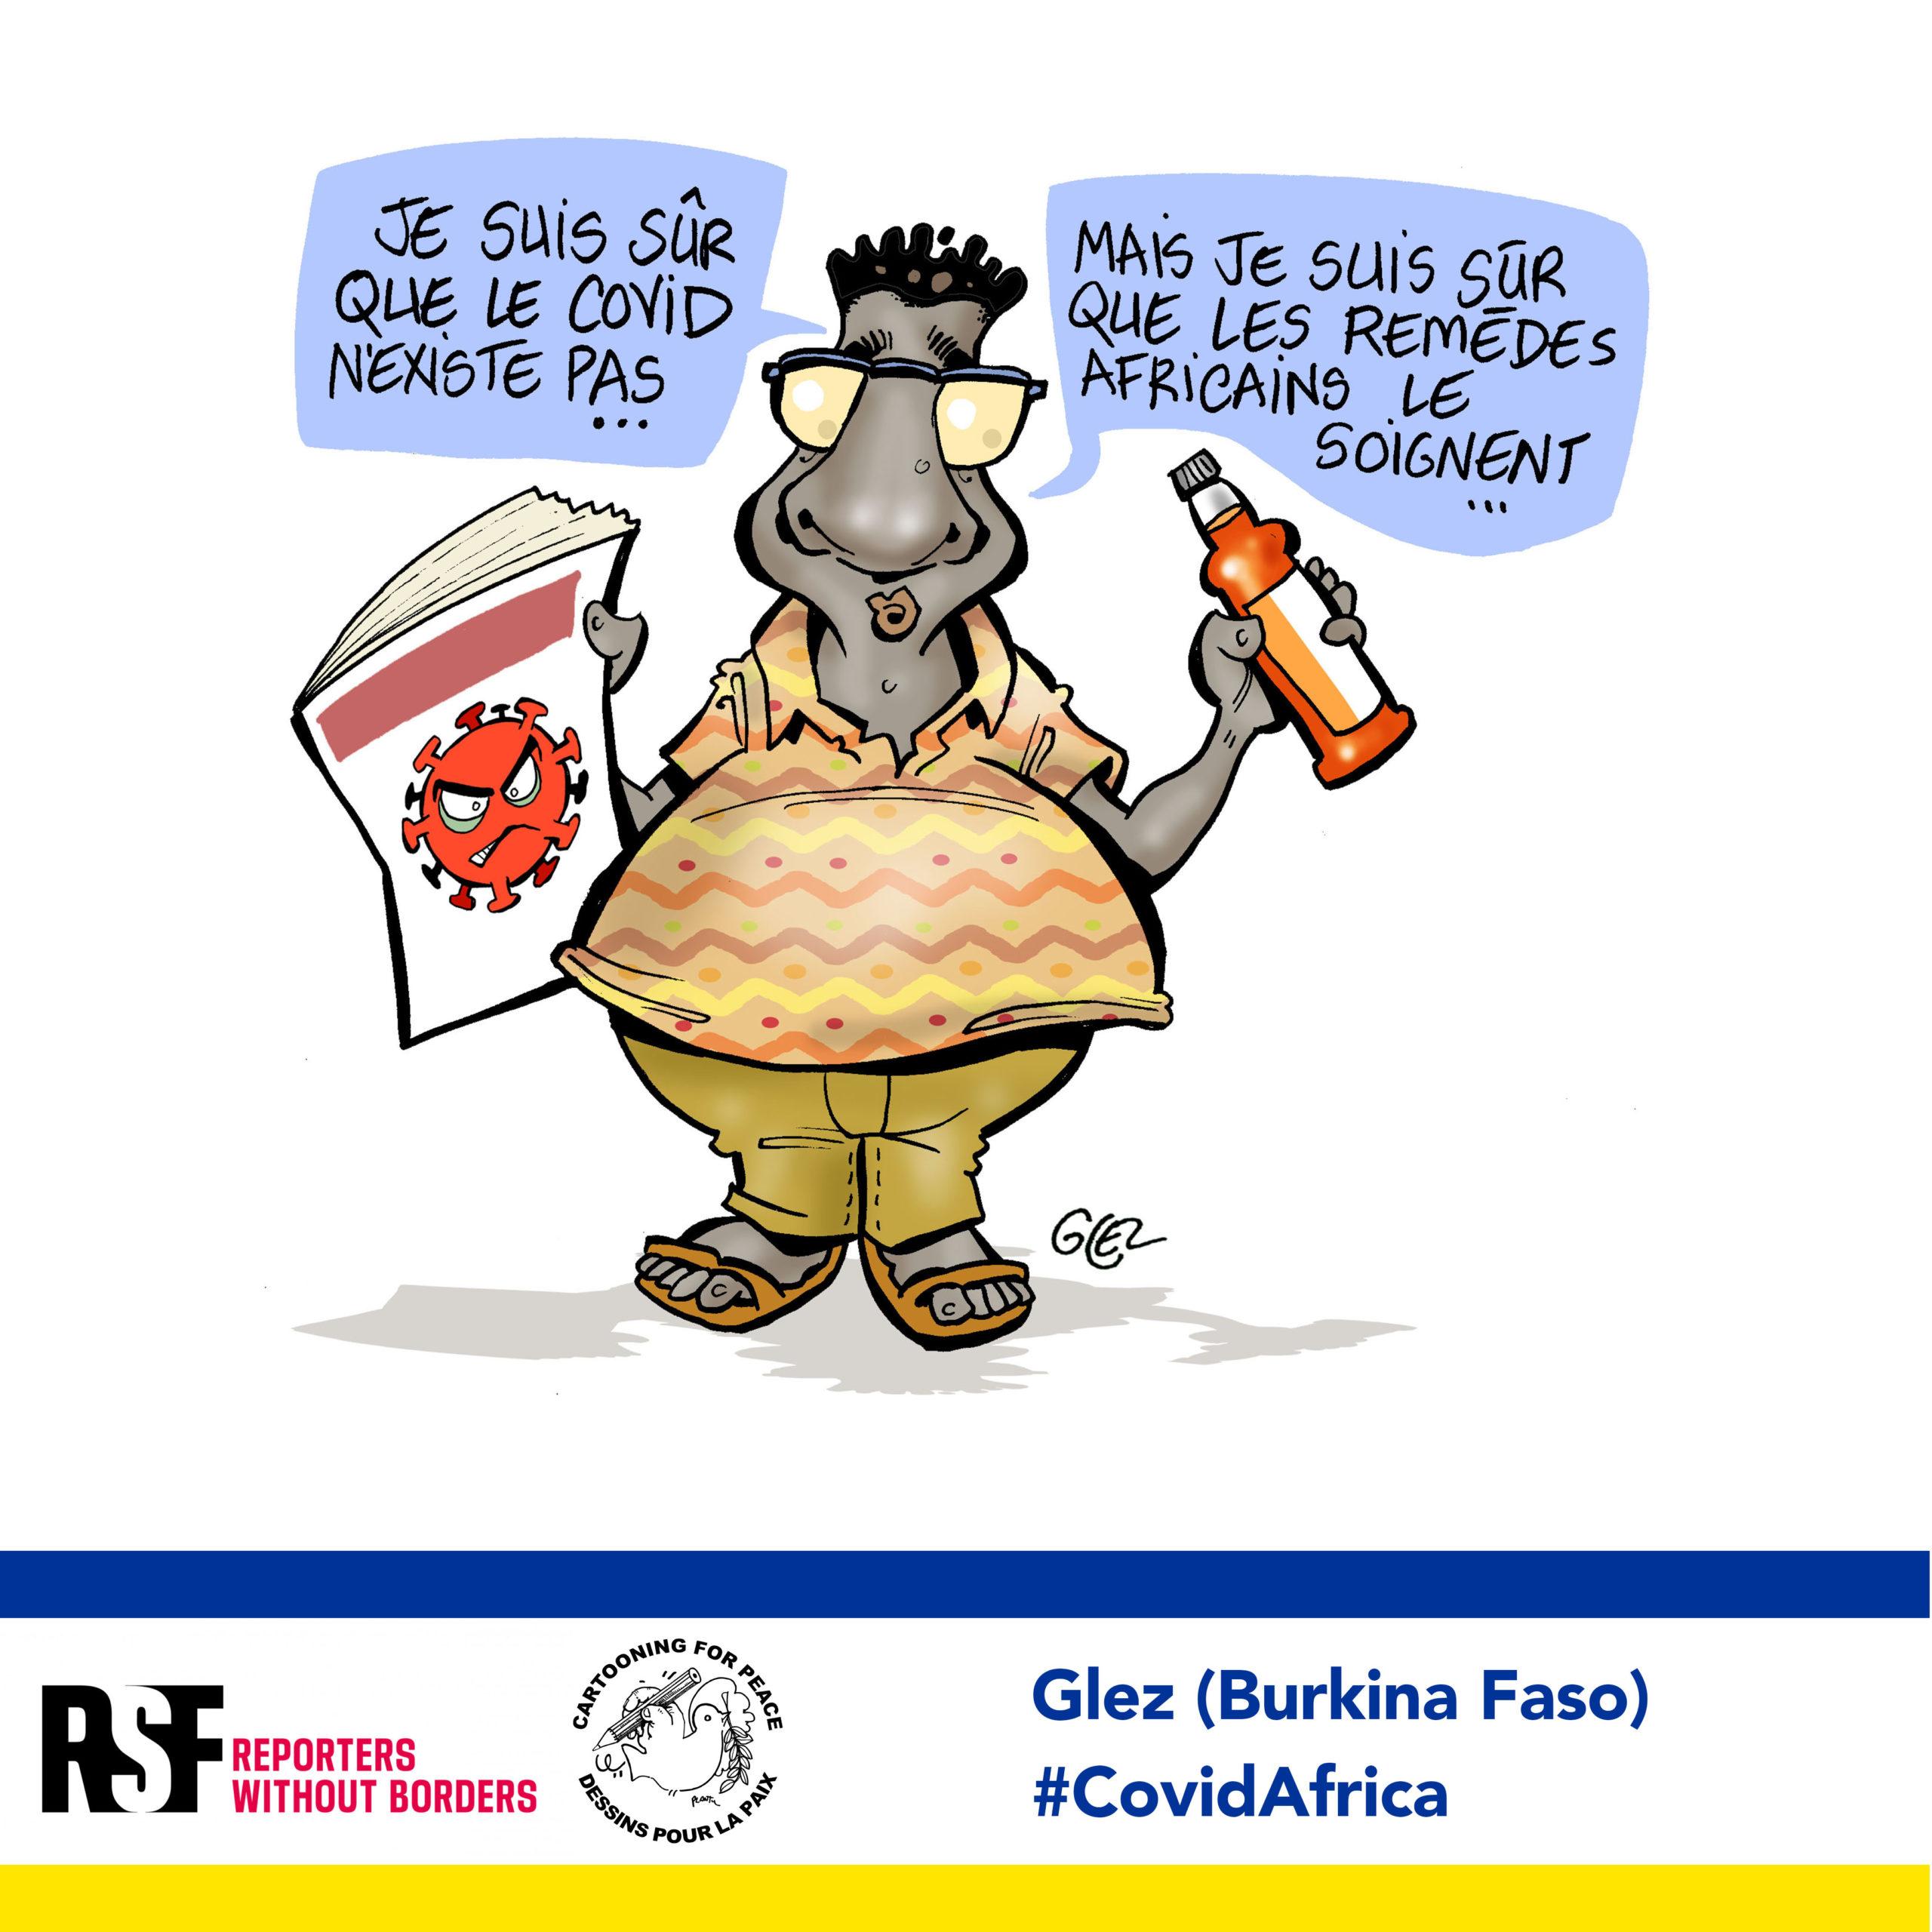 03 Glez (Burkina Faso)